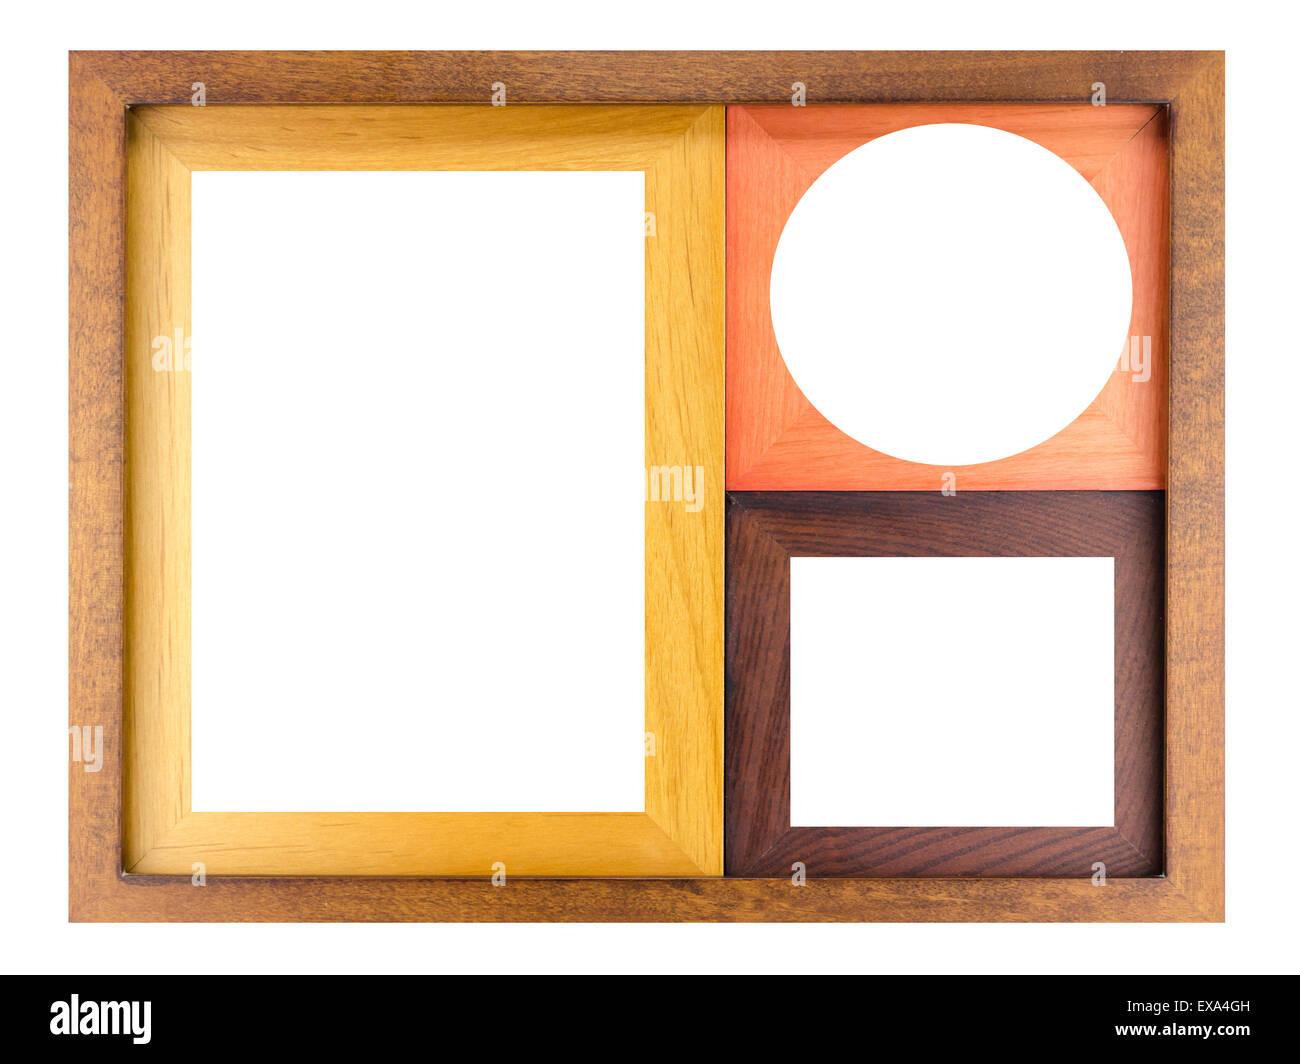 Frame multiple photos Stock Photo: 85045649 - Alamy